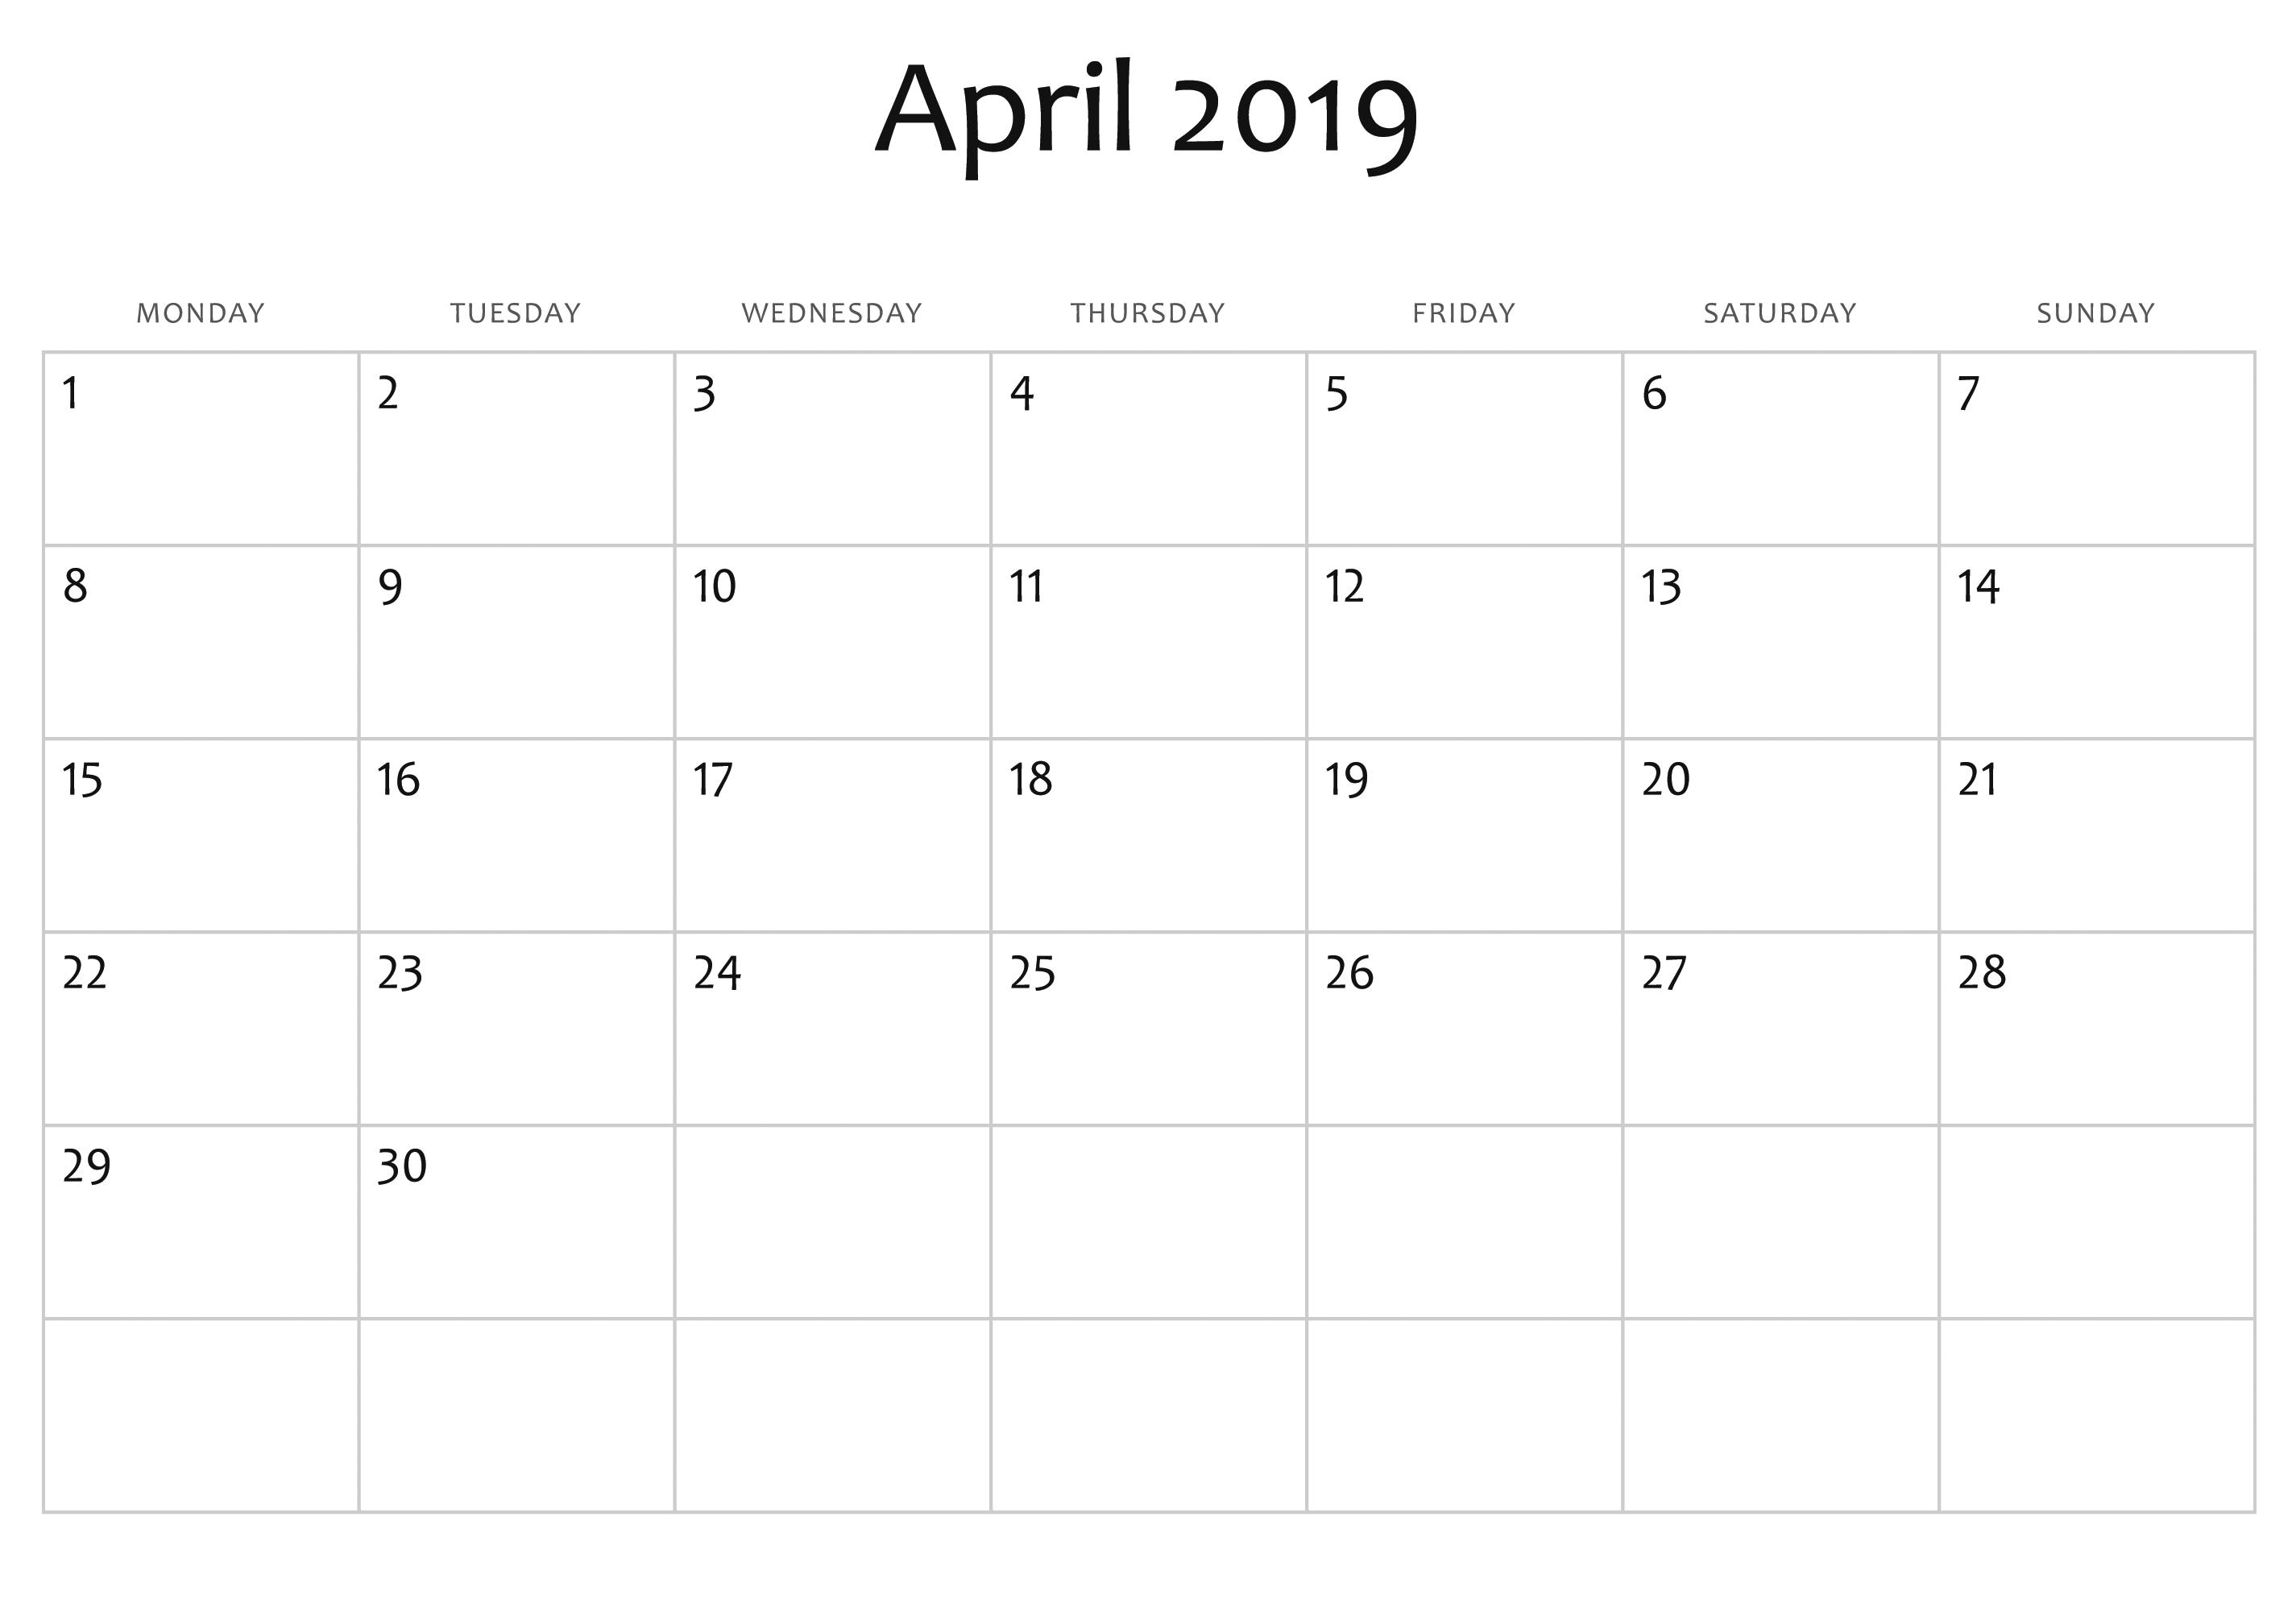 Fillable 2019 Calendar Fillable Blank April 2019 Calendar Printable Template #Tumblr